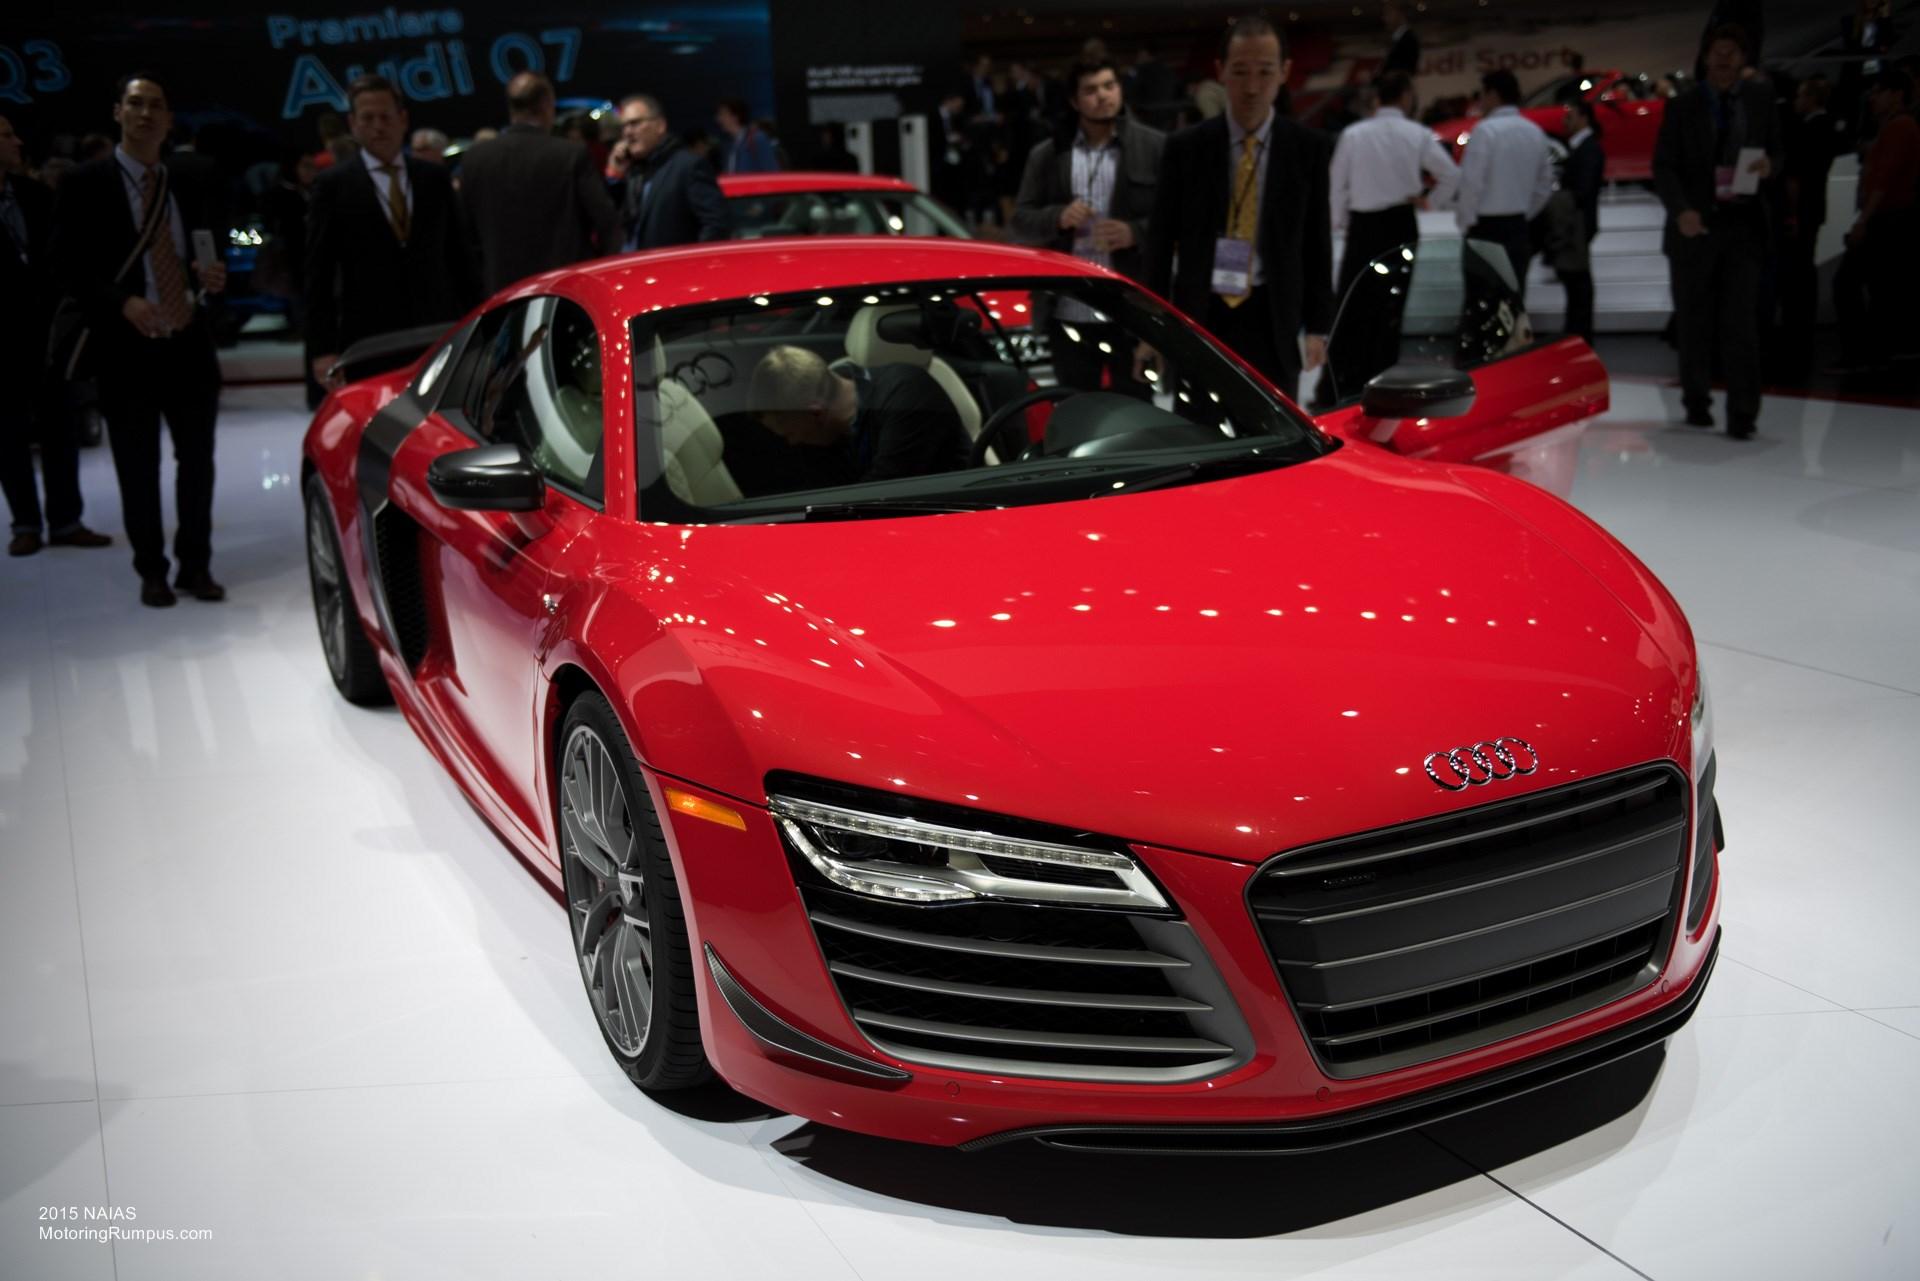 2015 NAIAS Audi R8